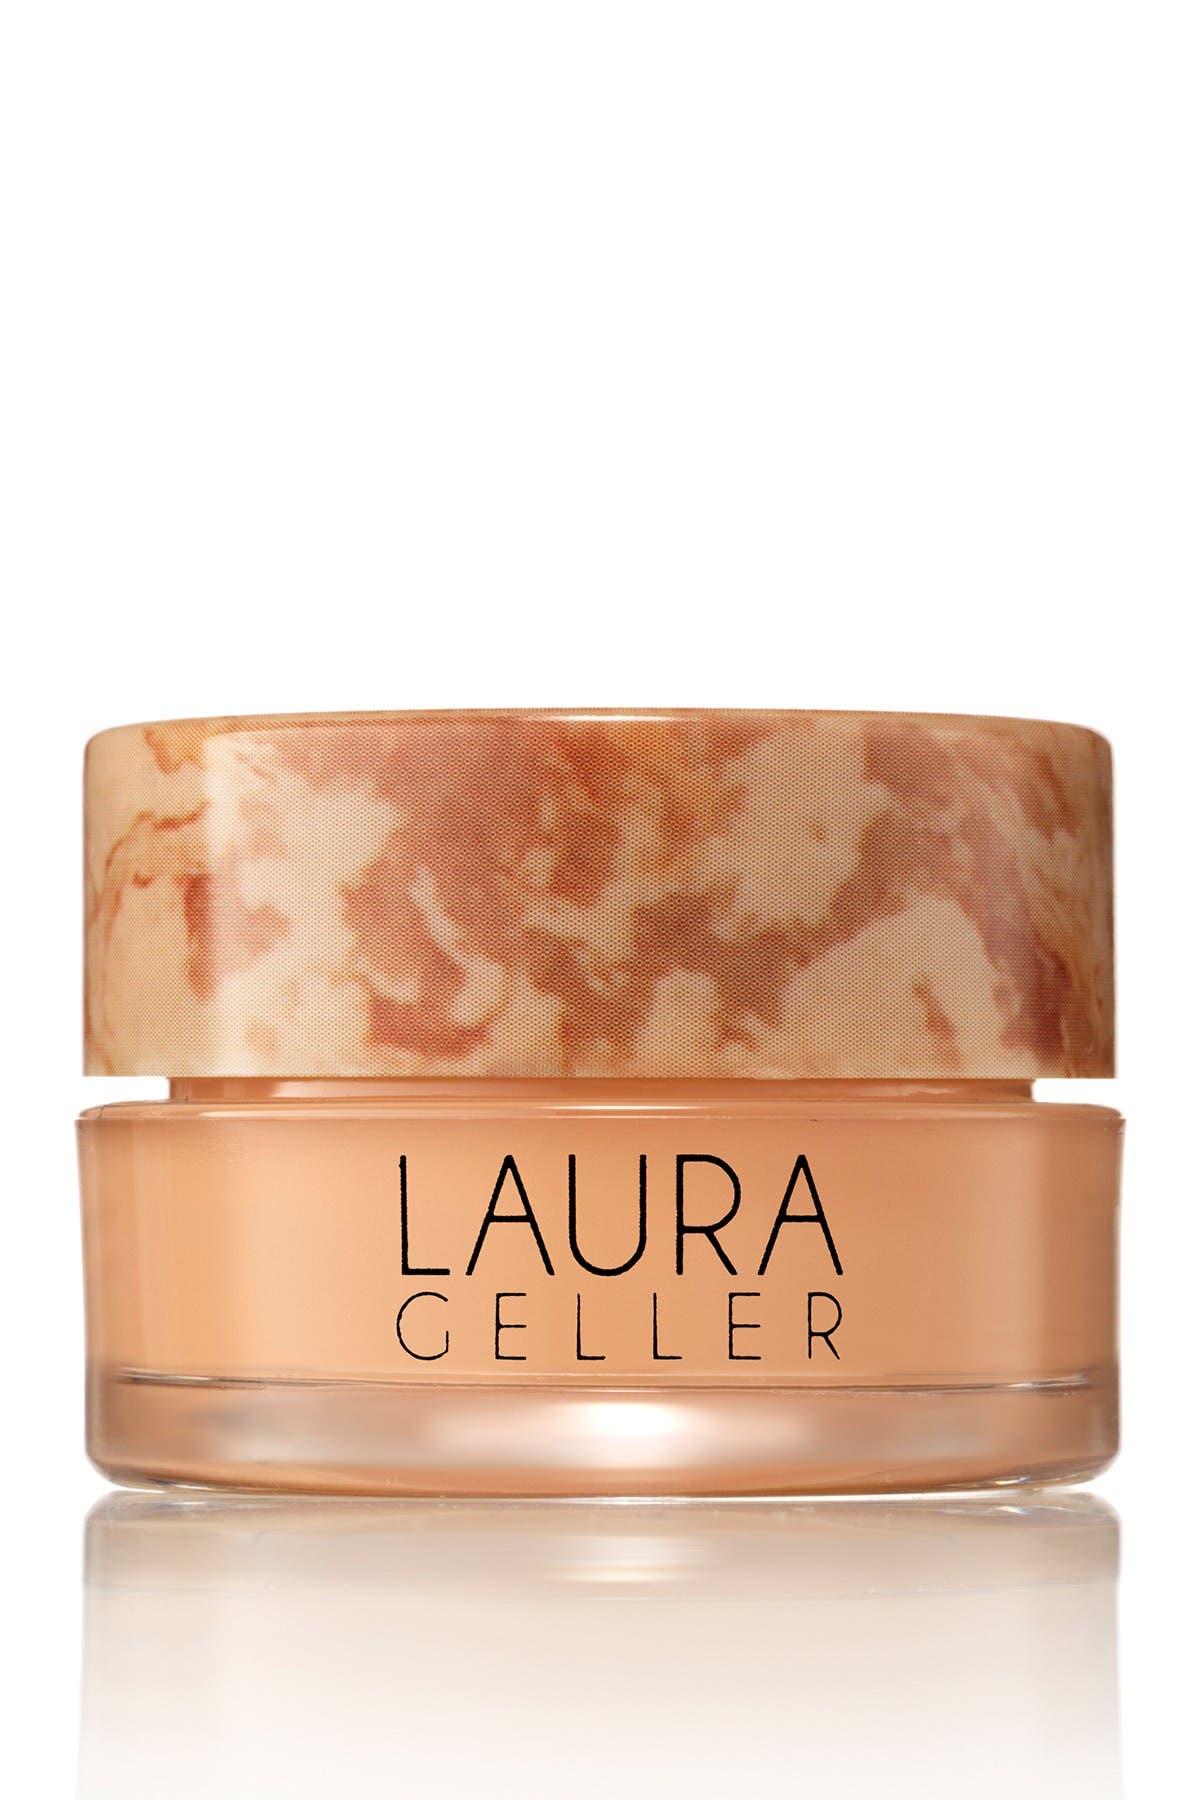 Image of Laura Geller New York Baked Radiance Cream Concealer - Medium